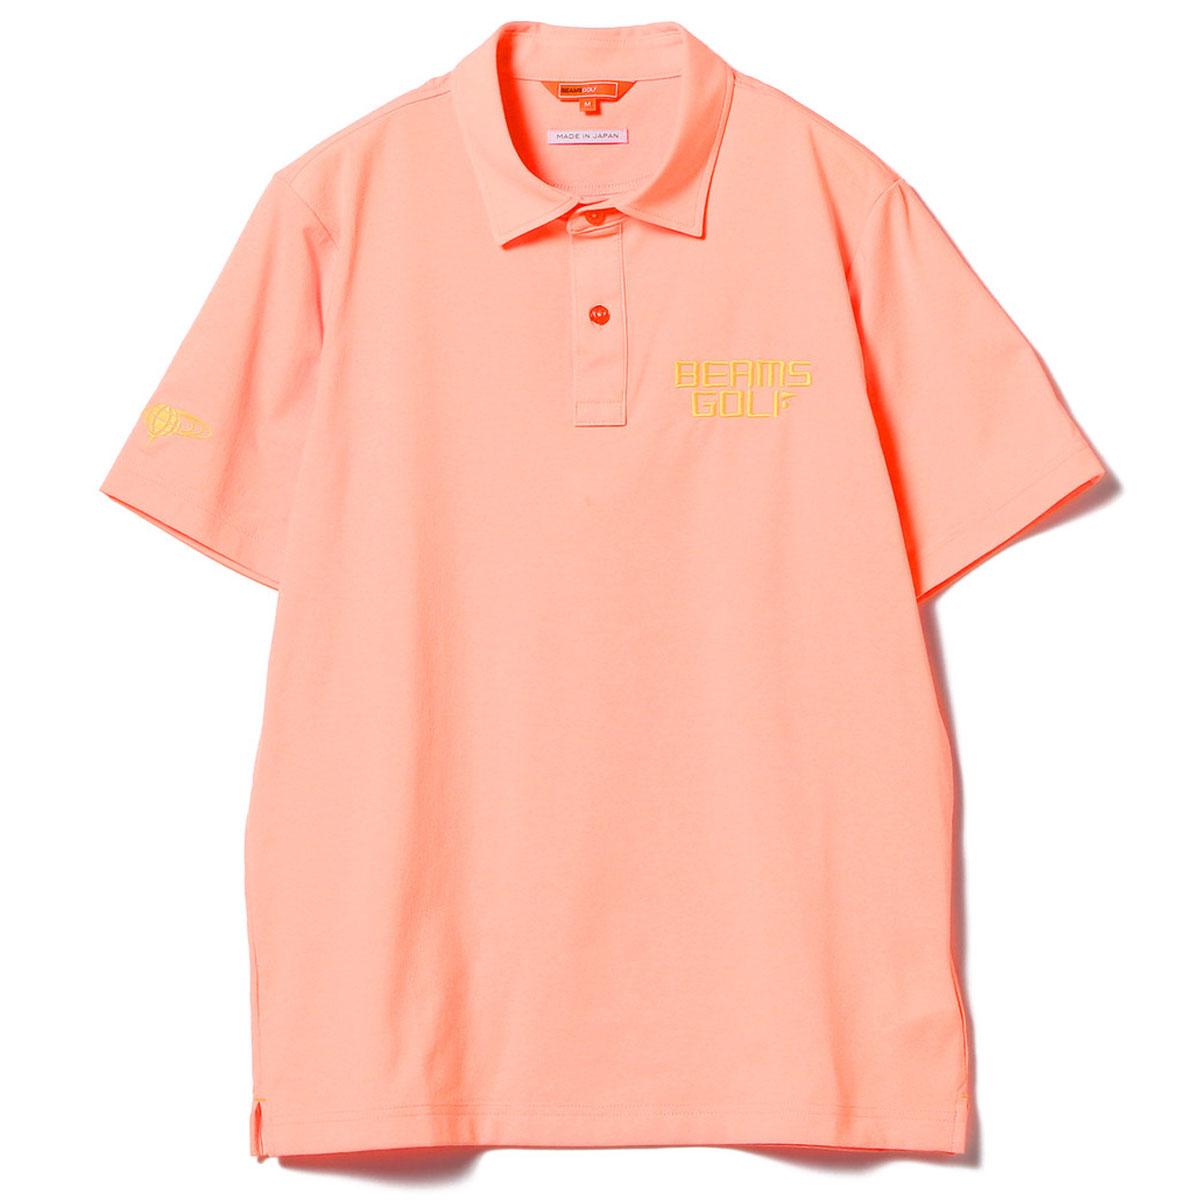 BEAMS GOLF ORANGE LABEL ネオンカラー ポロシャツ